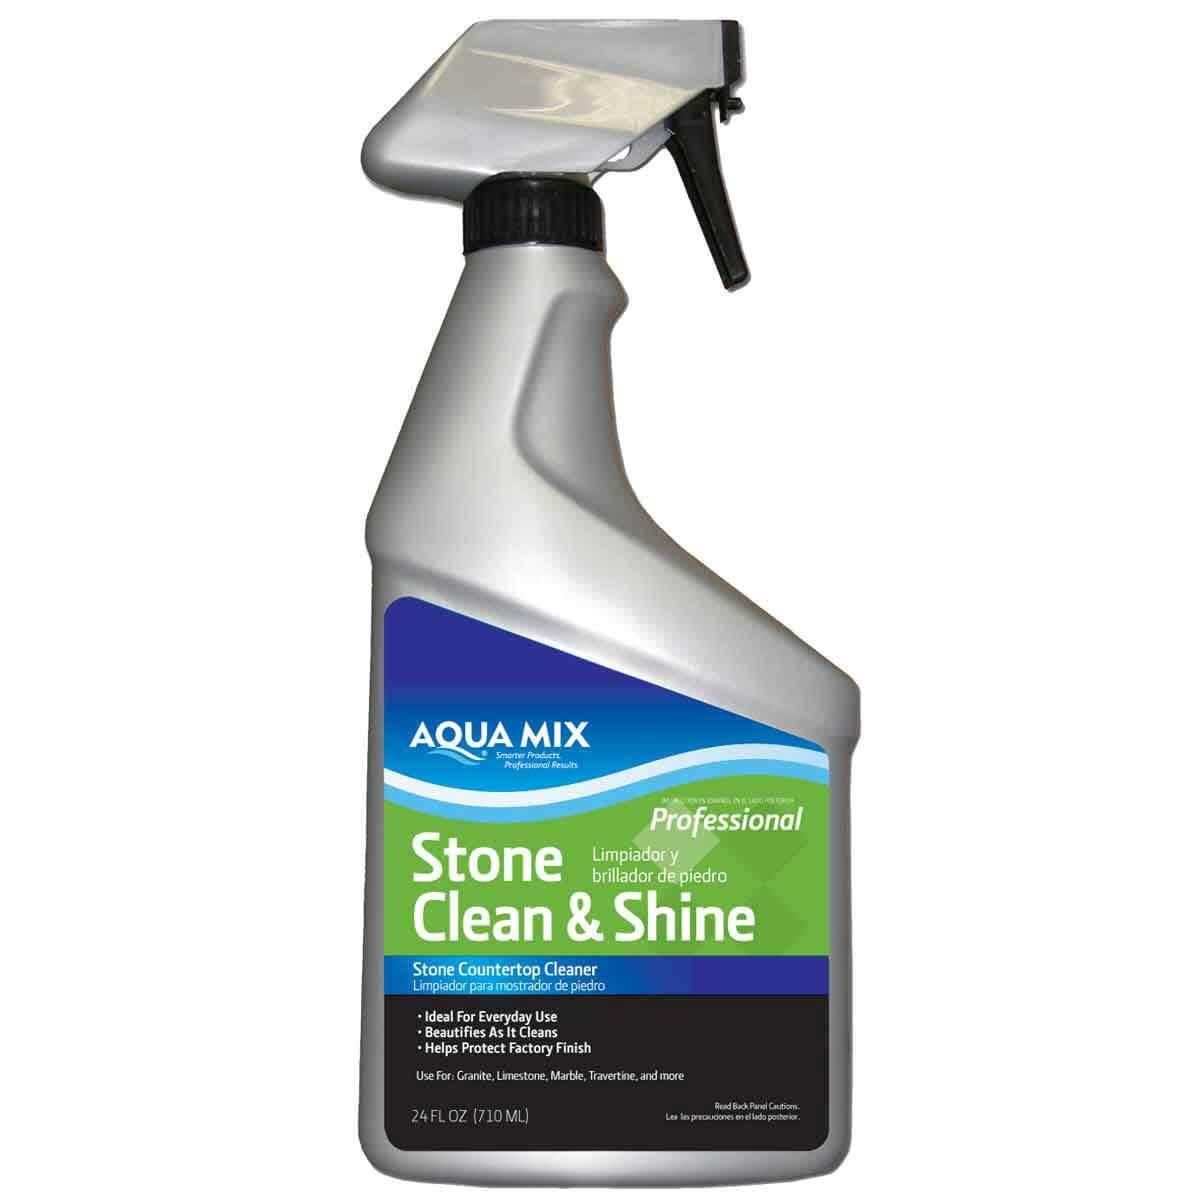 Aqua Mix Stone Clean & Shine 24oz Spray Bottle 030151-4